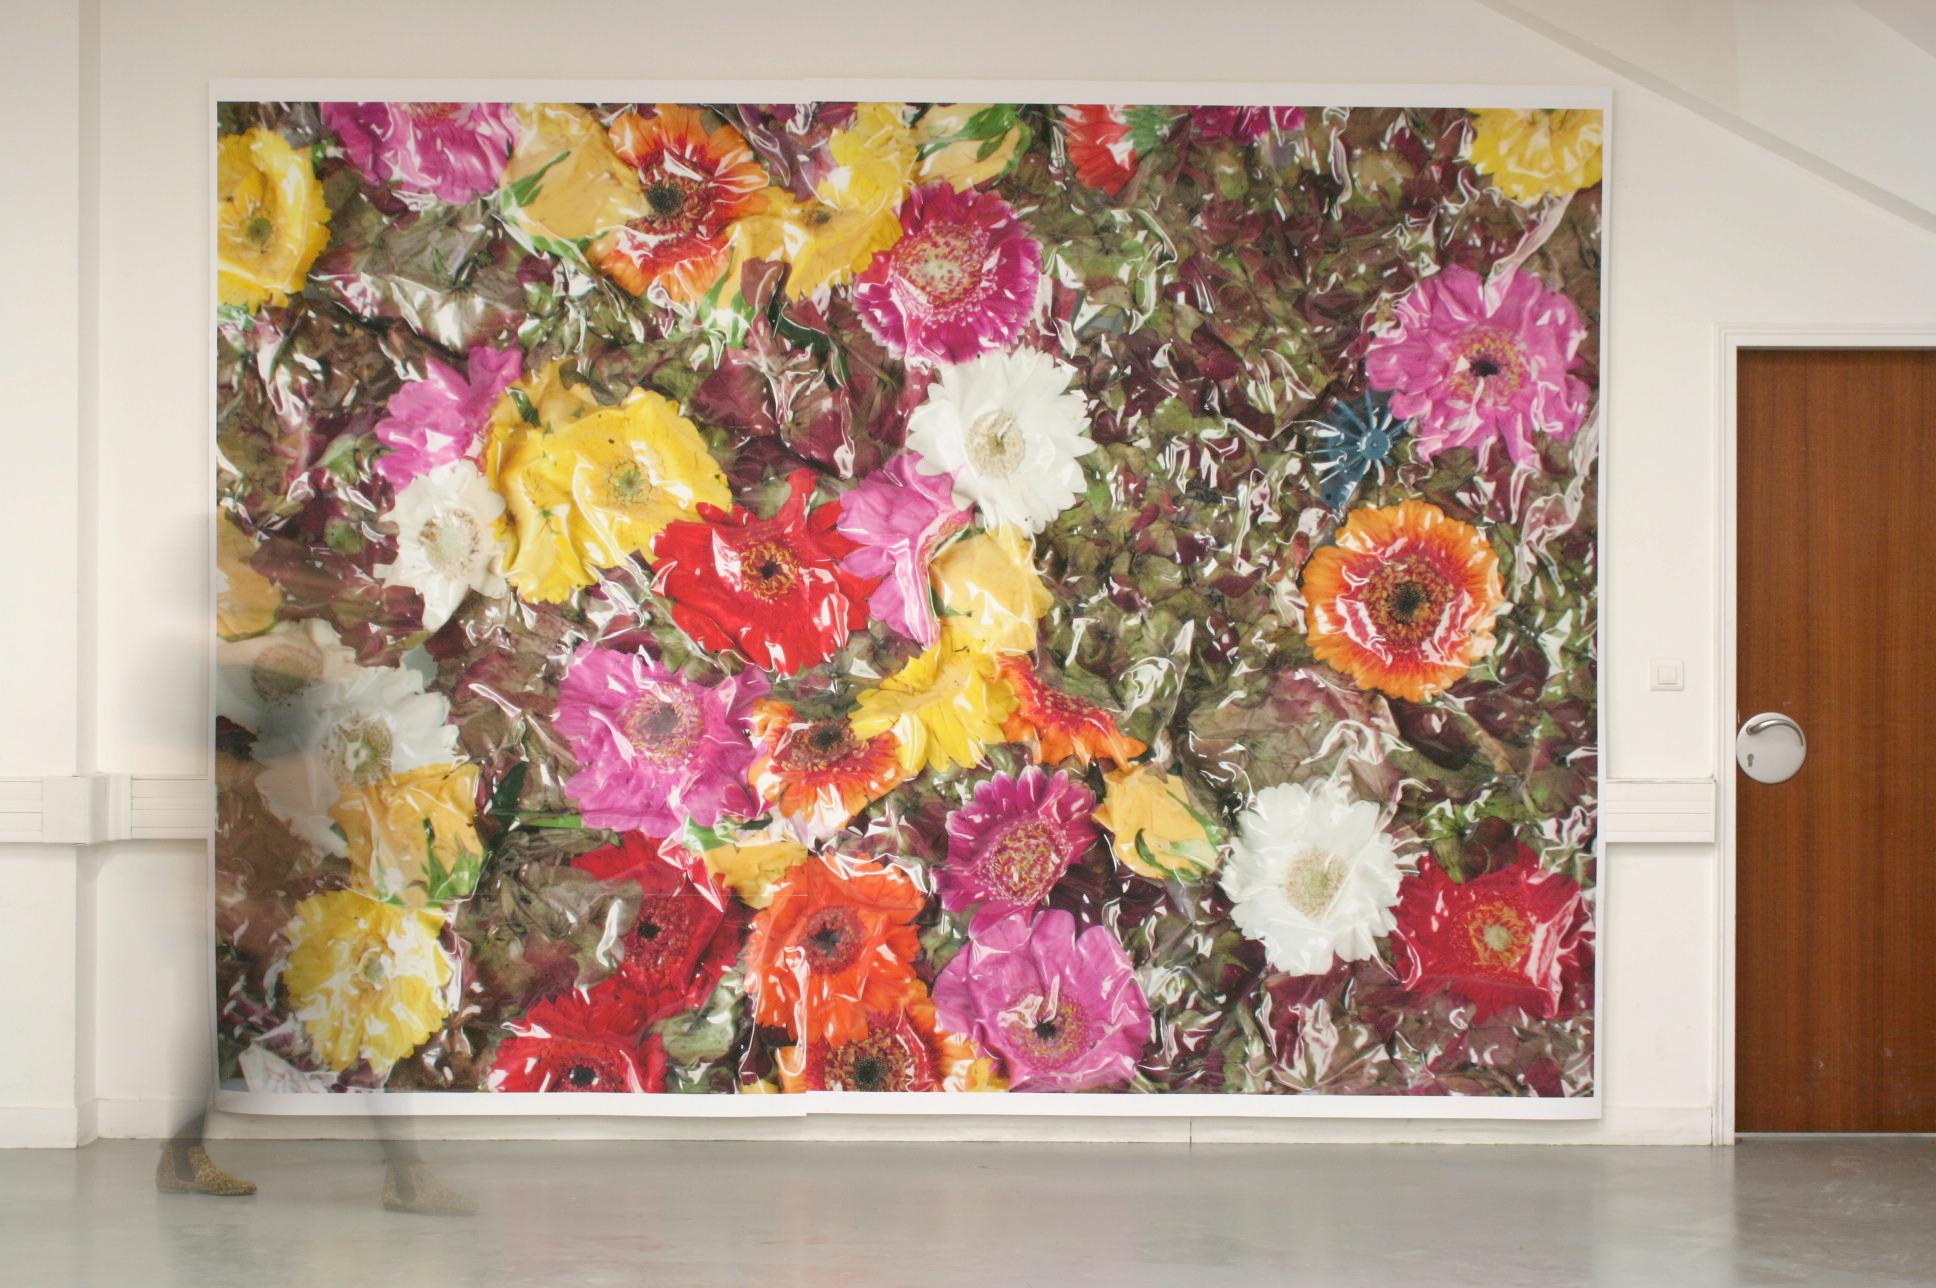 Compression Florale - 2012  Digitale print op bache 300 x 200 cm  Interesse? Contacteer ons